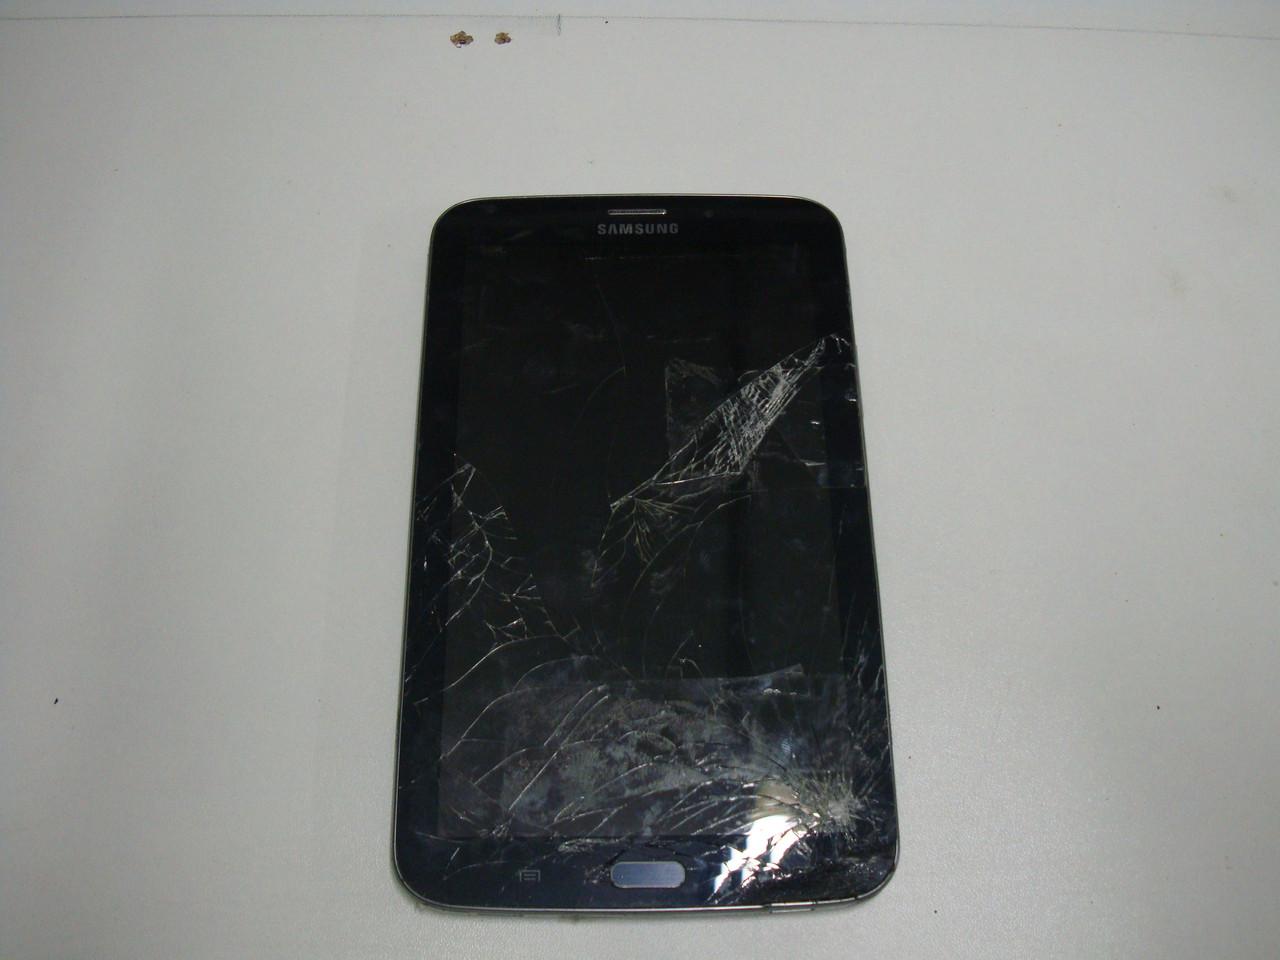 Samsung T211 3G 8GB планшет на запчасти (материнская плата, батарея, экран, камера, корпус, разбитый тачскрин)